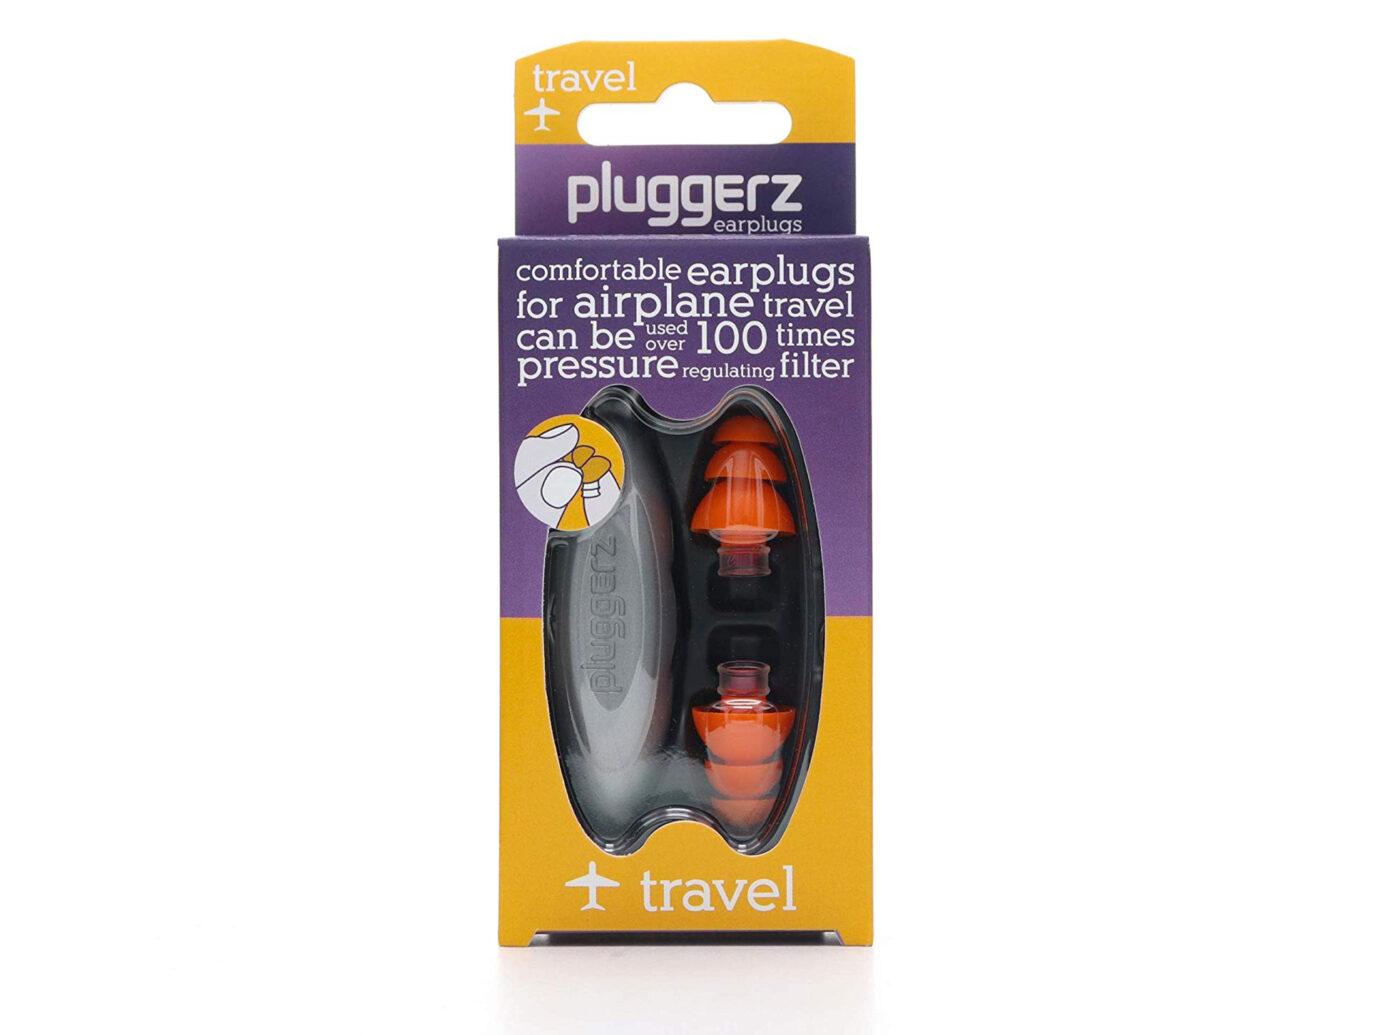 Pluggerz Travel Ear Plugs